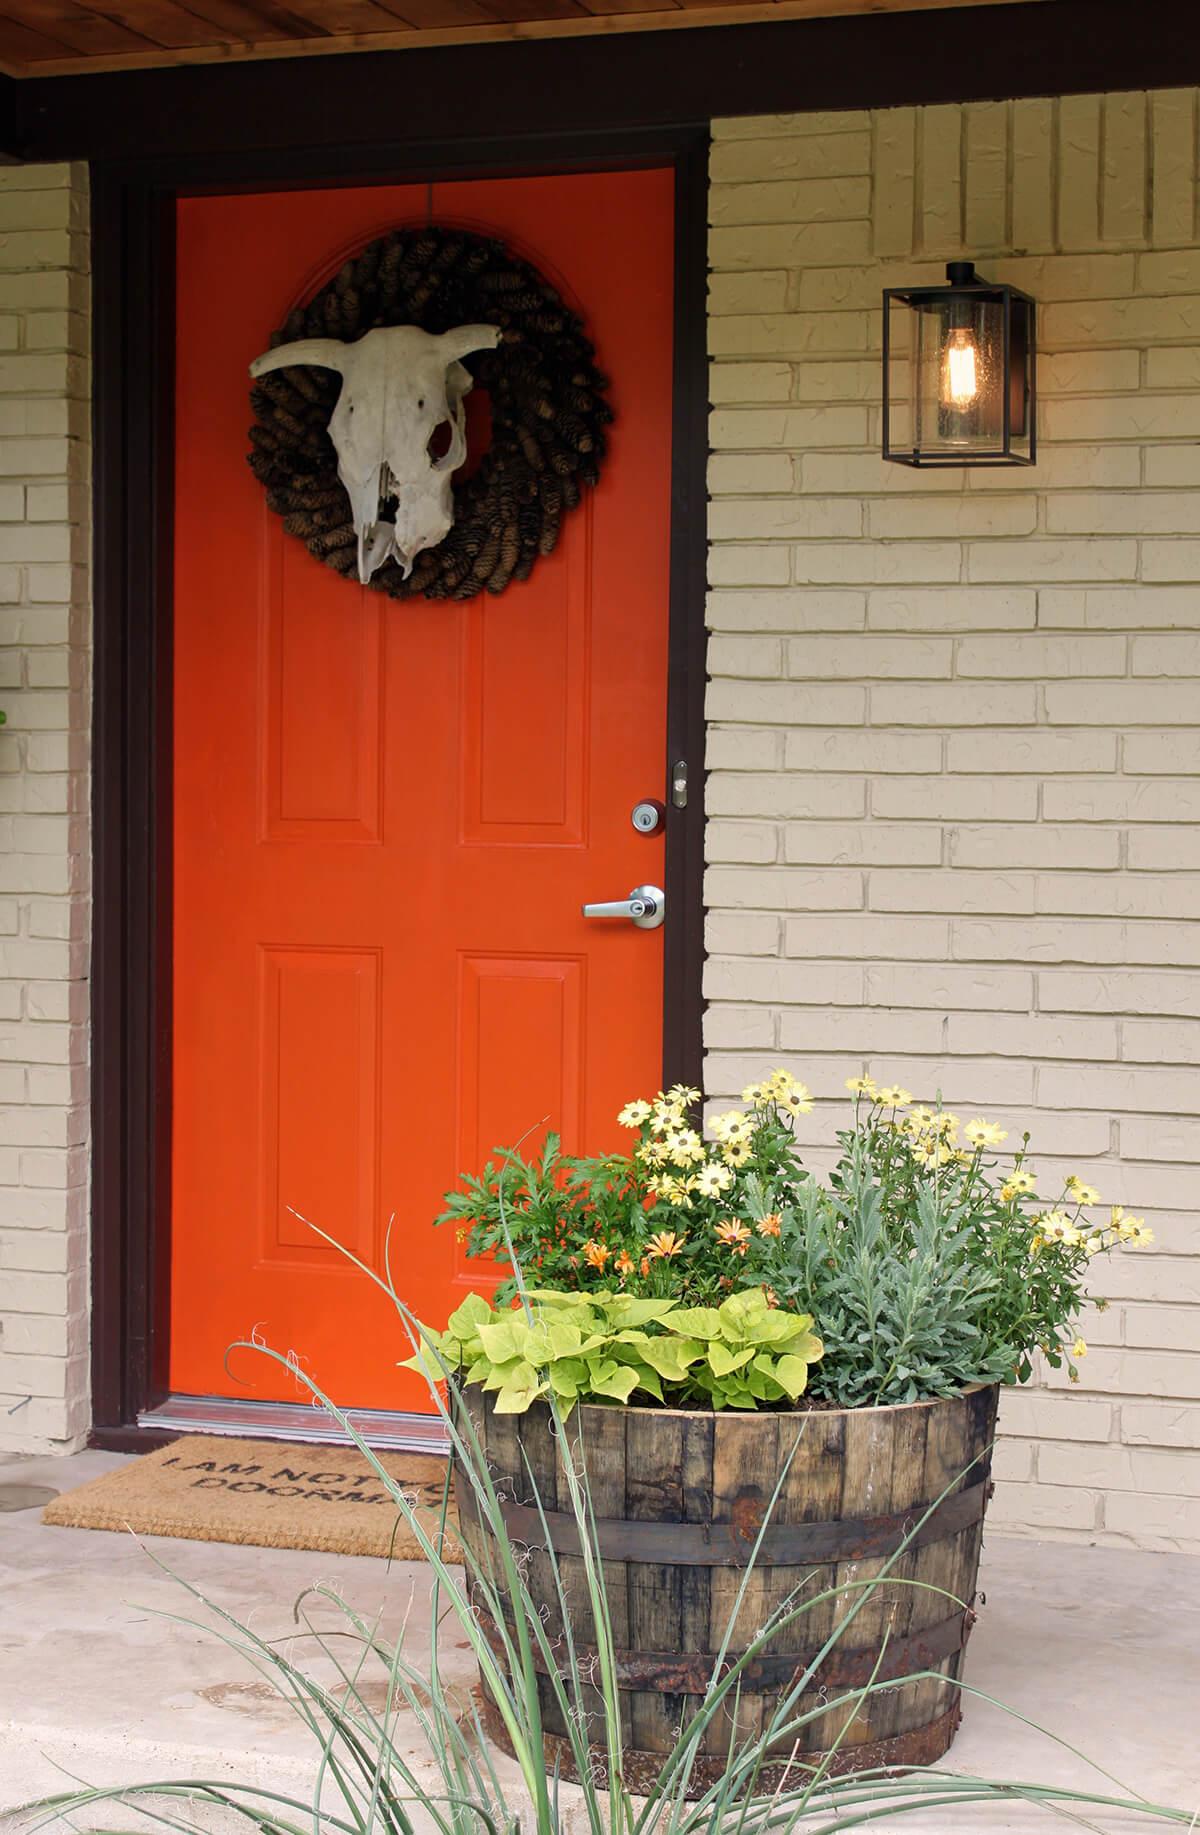 30 Best Front Door Color Ideas and Designs for 2020 on Door Color Ideas  id=38446